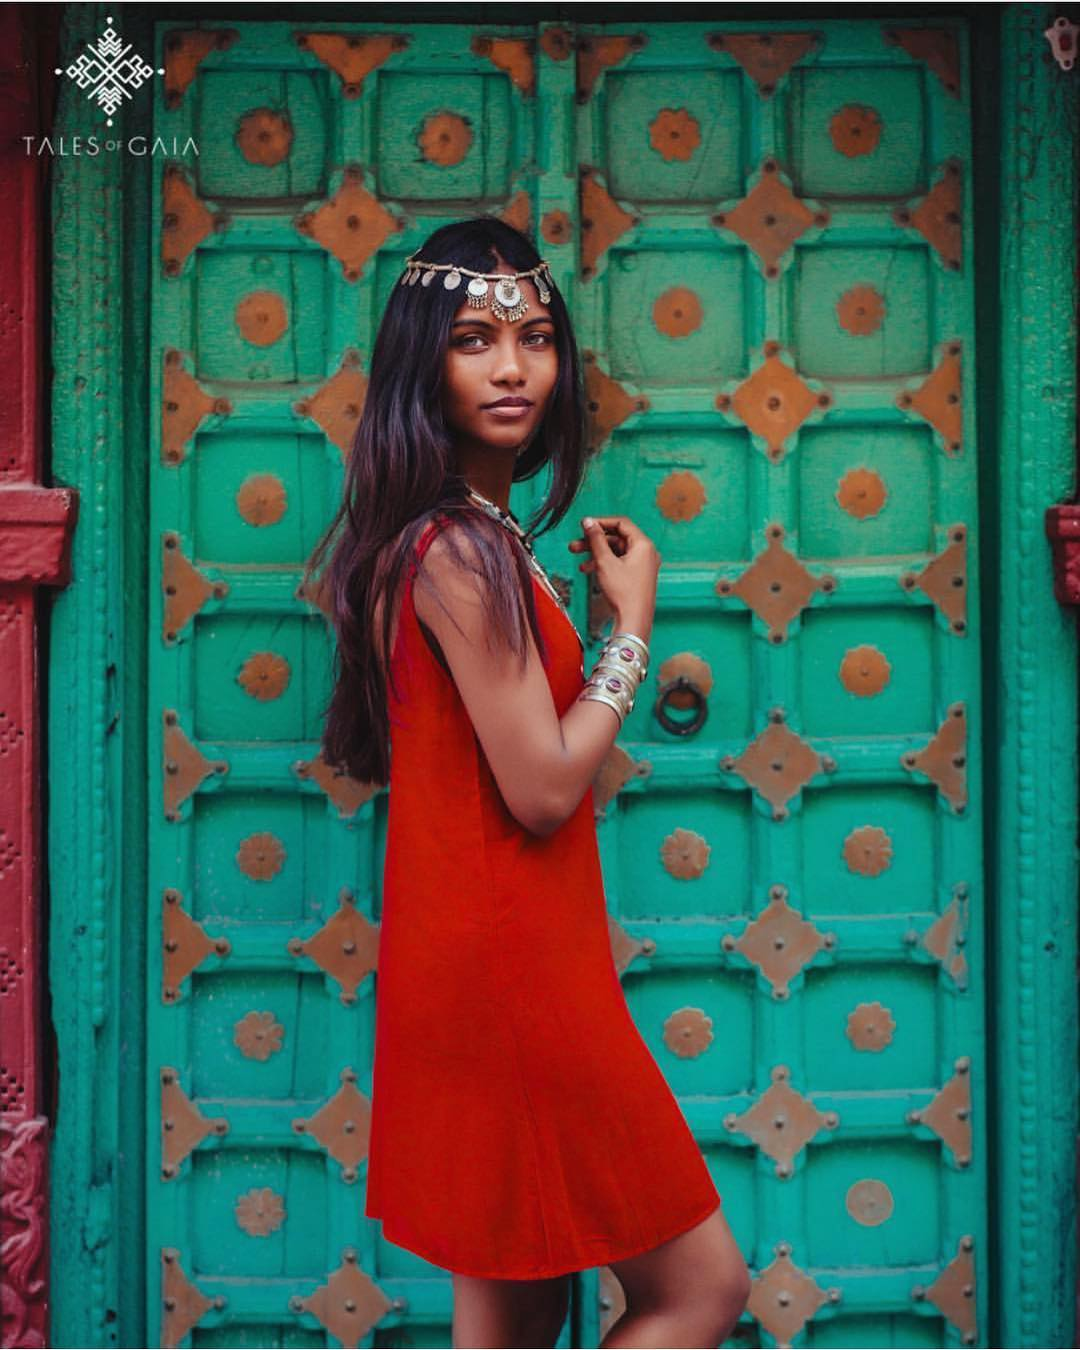 Prelepa manekenka pronađena mrtva i Bangladešu (foto: Instagram.comraudhaathif)